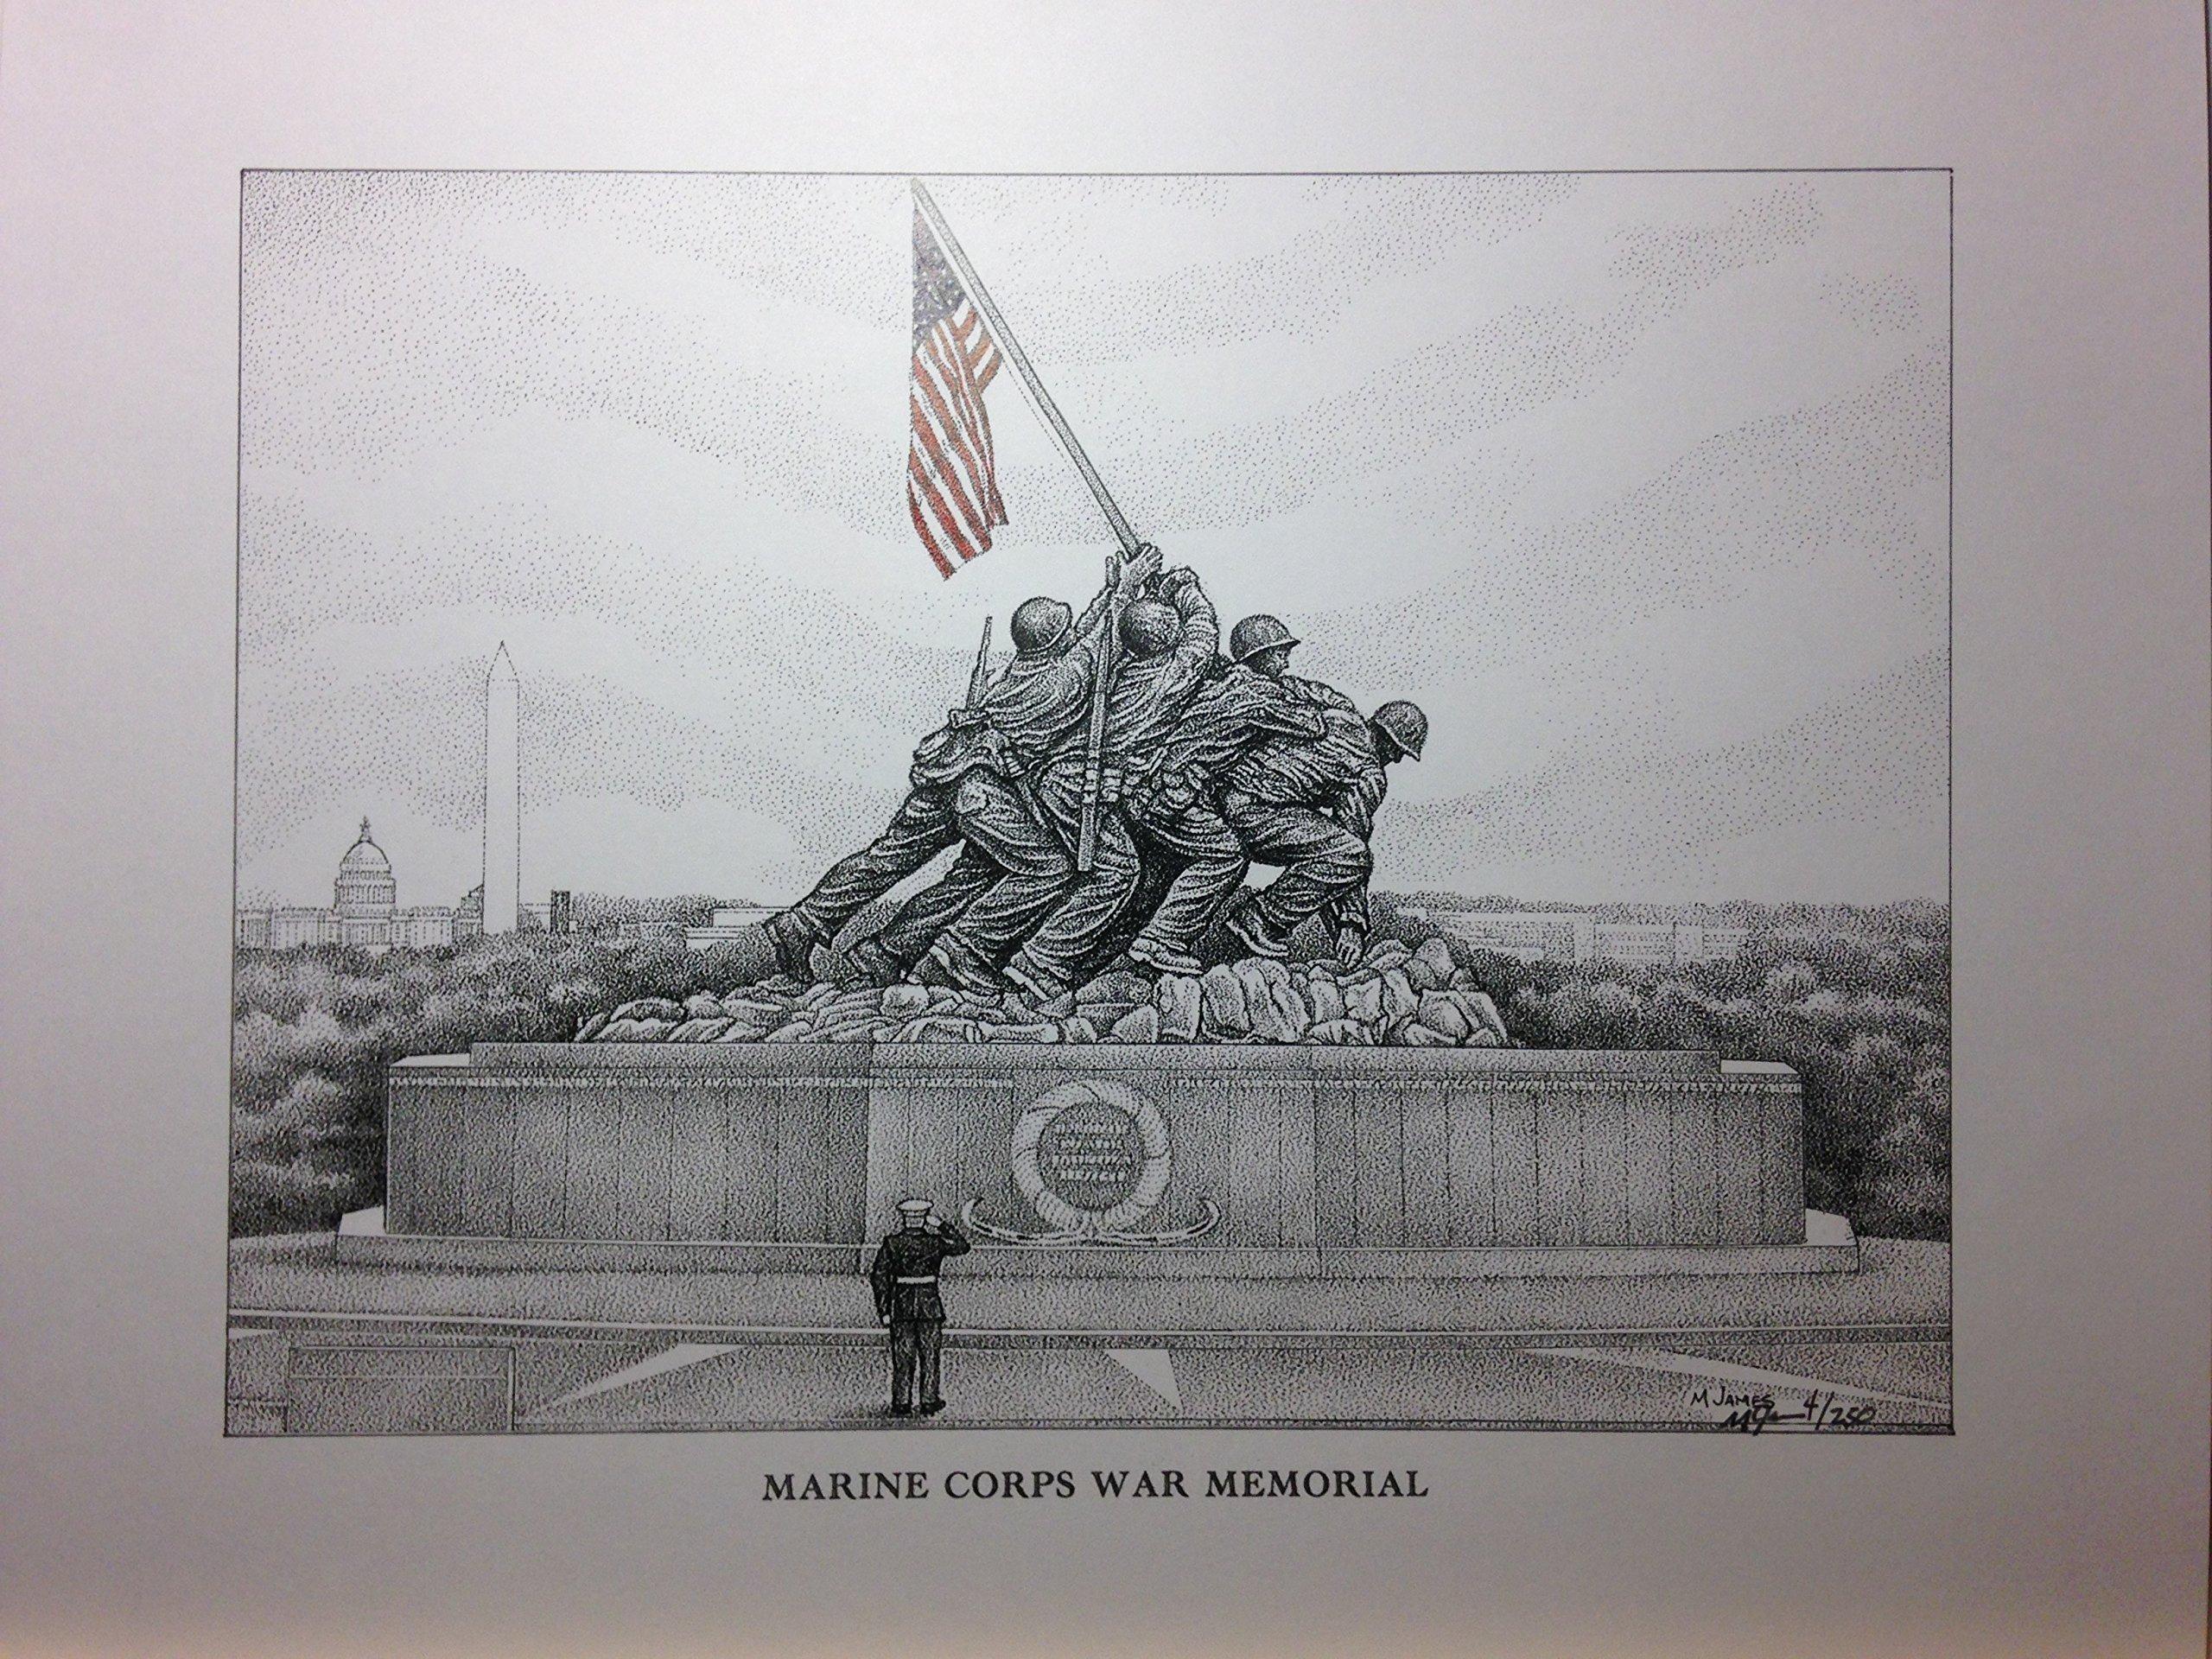 Marine Corps War Memorial (Iwo Jima Flag Raising) 11''x14'' signed/numbered print